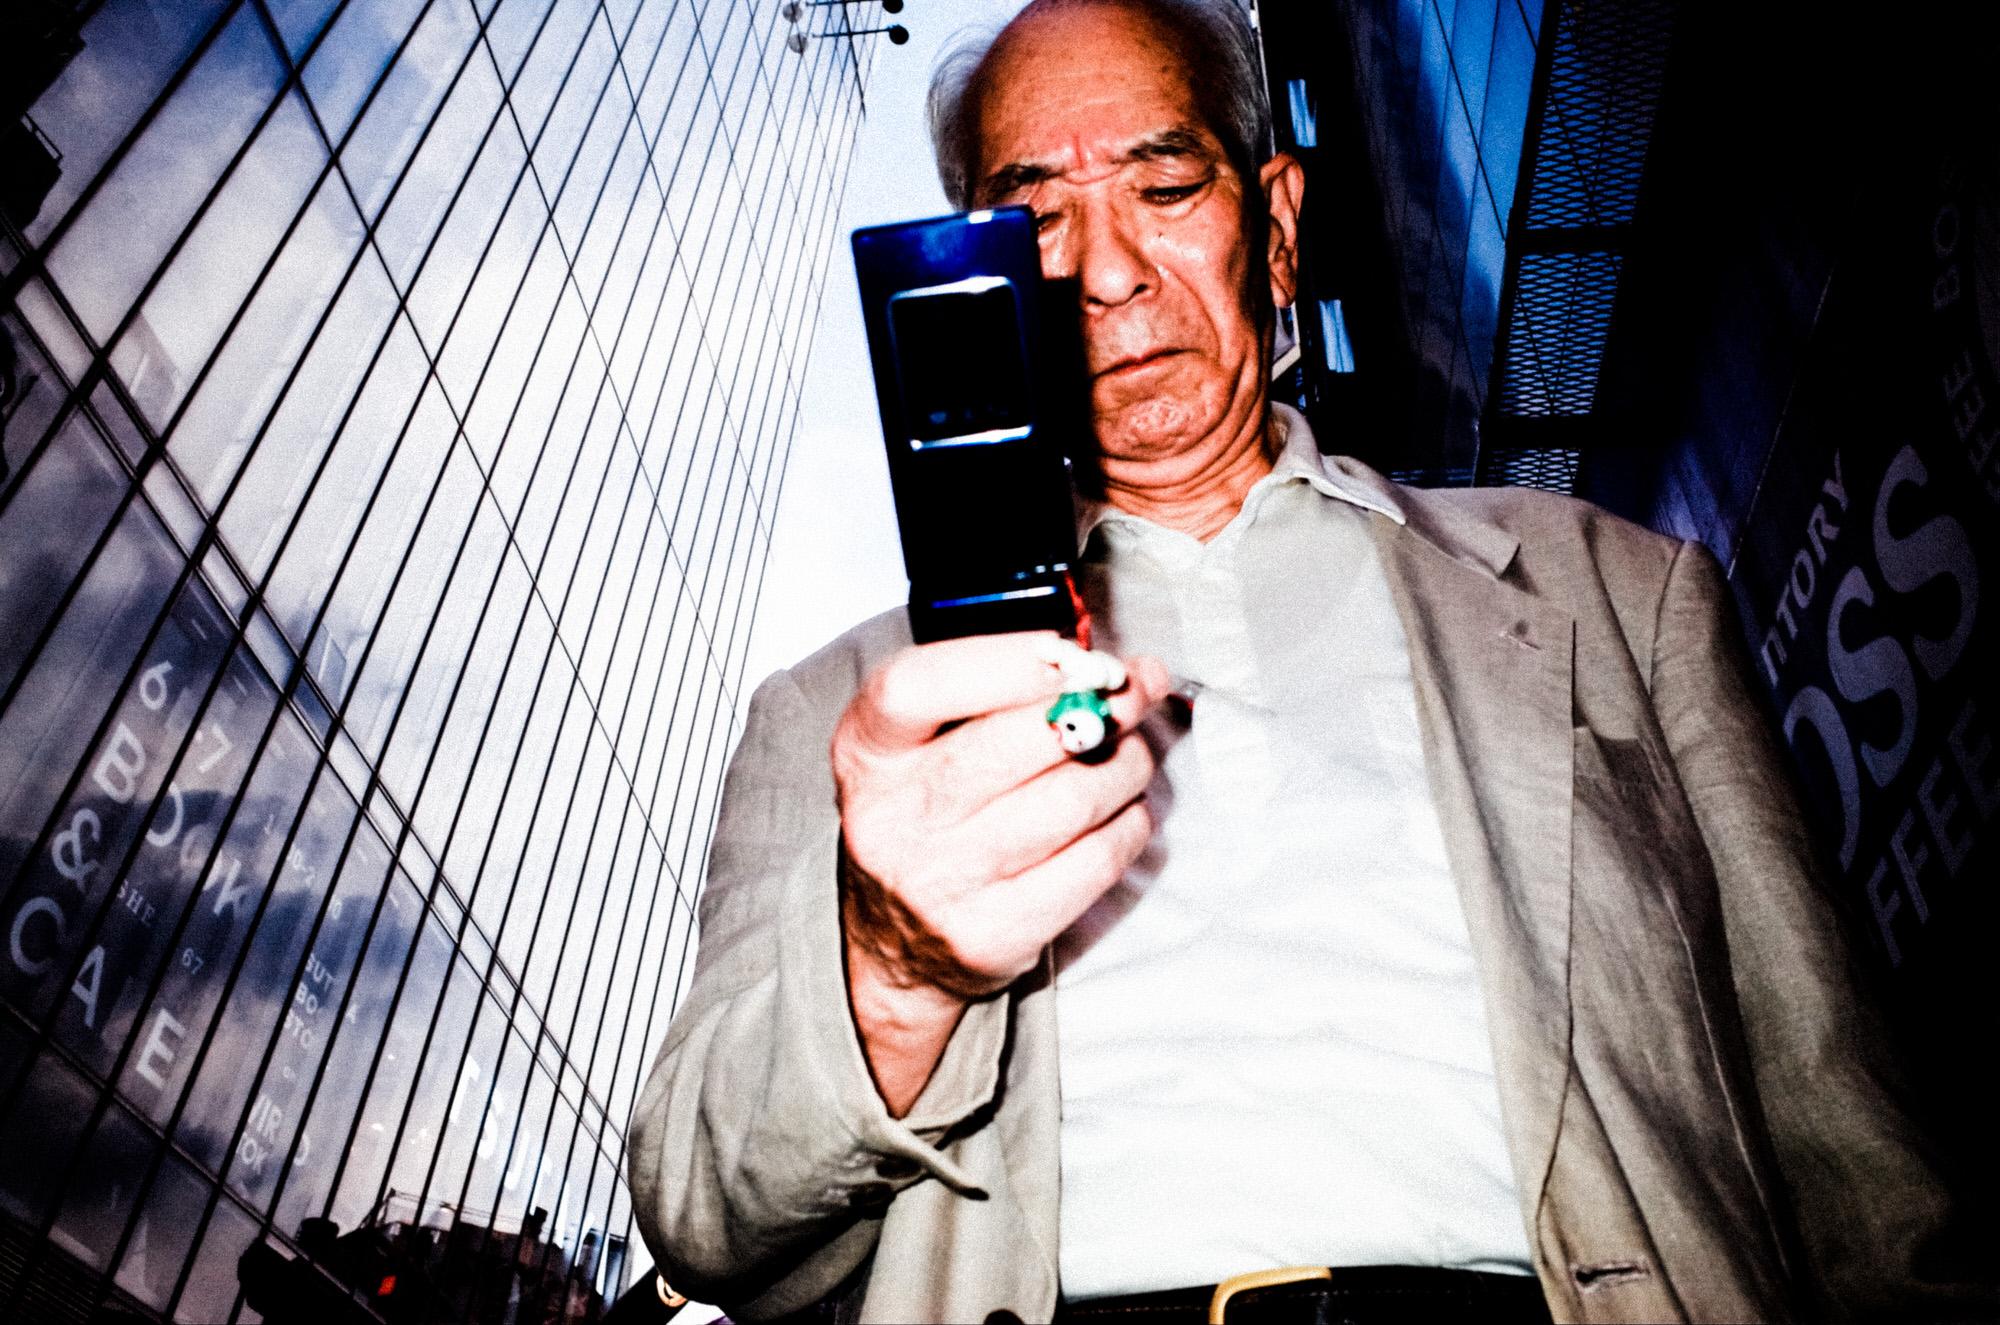 eric kim tokyo street photography 2017-0151979.JPG